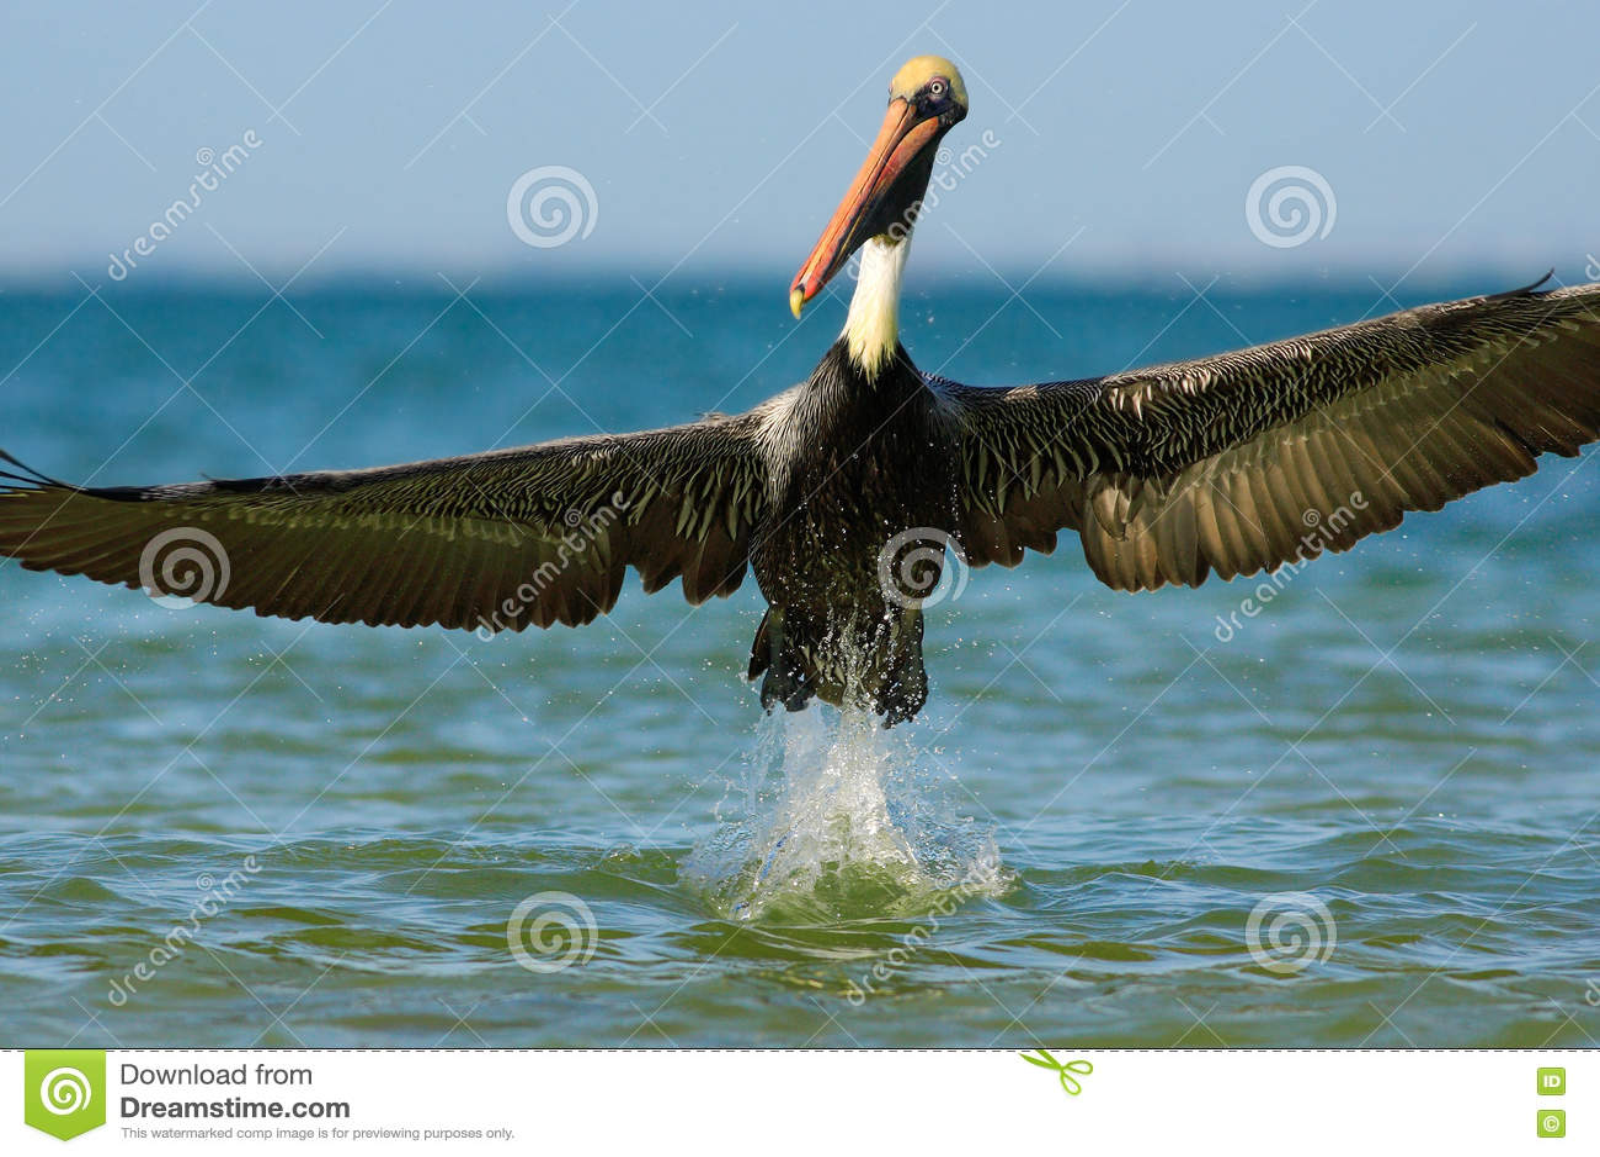 Pelican starting in the blue water. Brown Pelican splashing in water. bird in the dark water, nature habitat, Florida, USA.